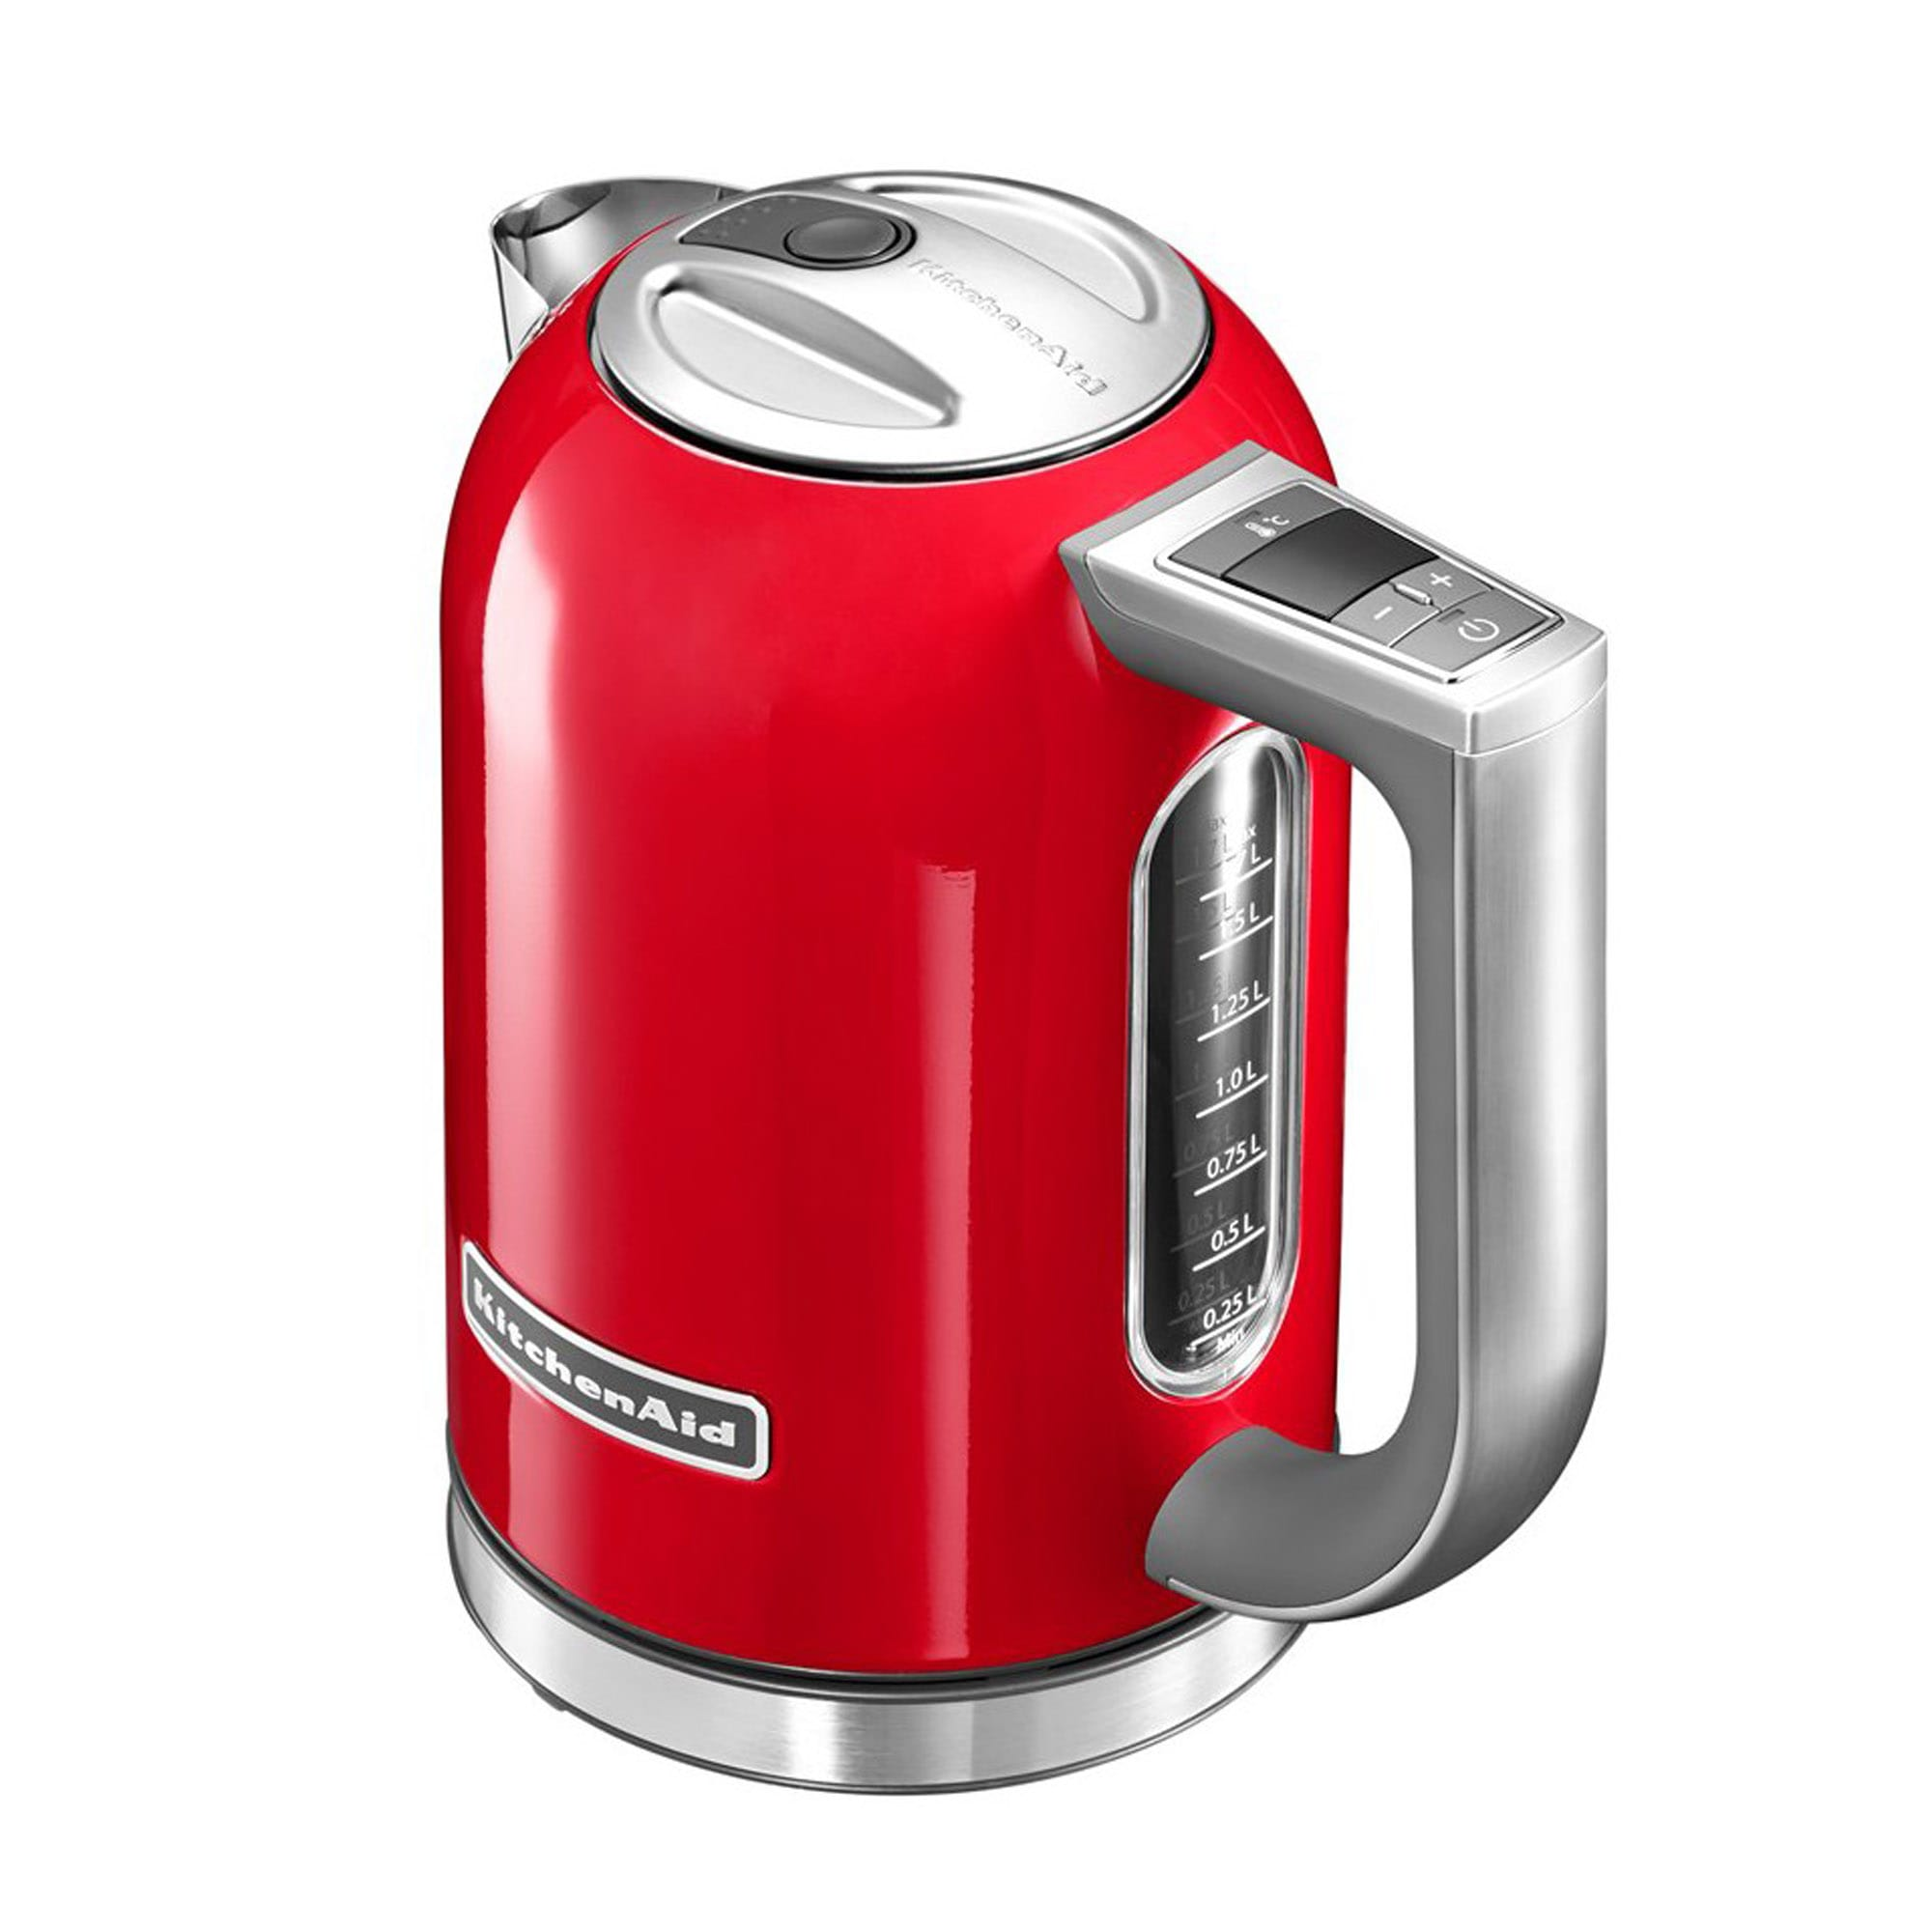 Wasserkocher 17 lt rot ~ Wasserkocher Natürlich Entkalken